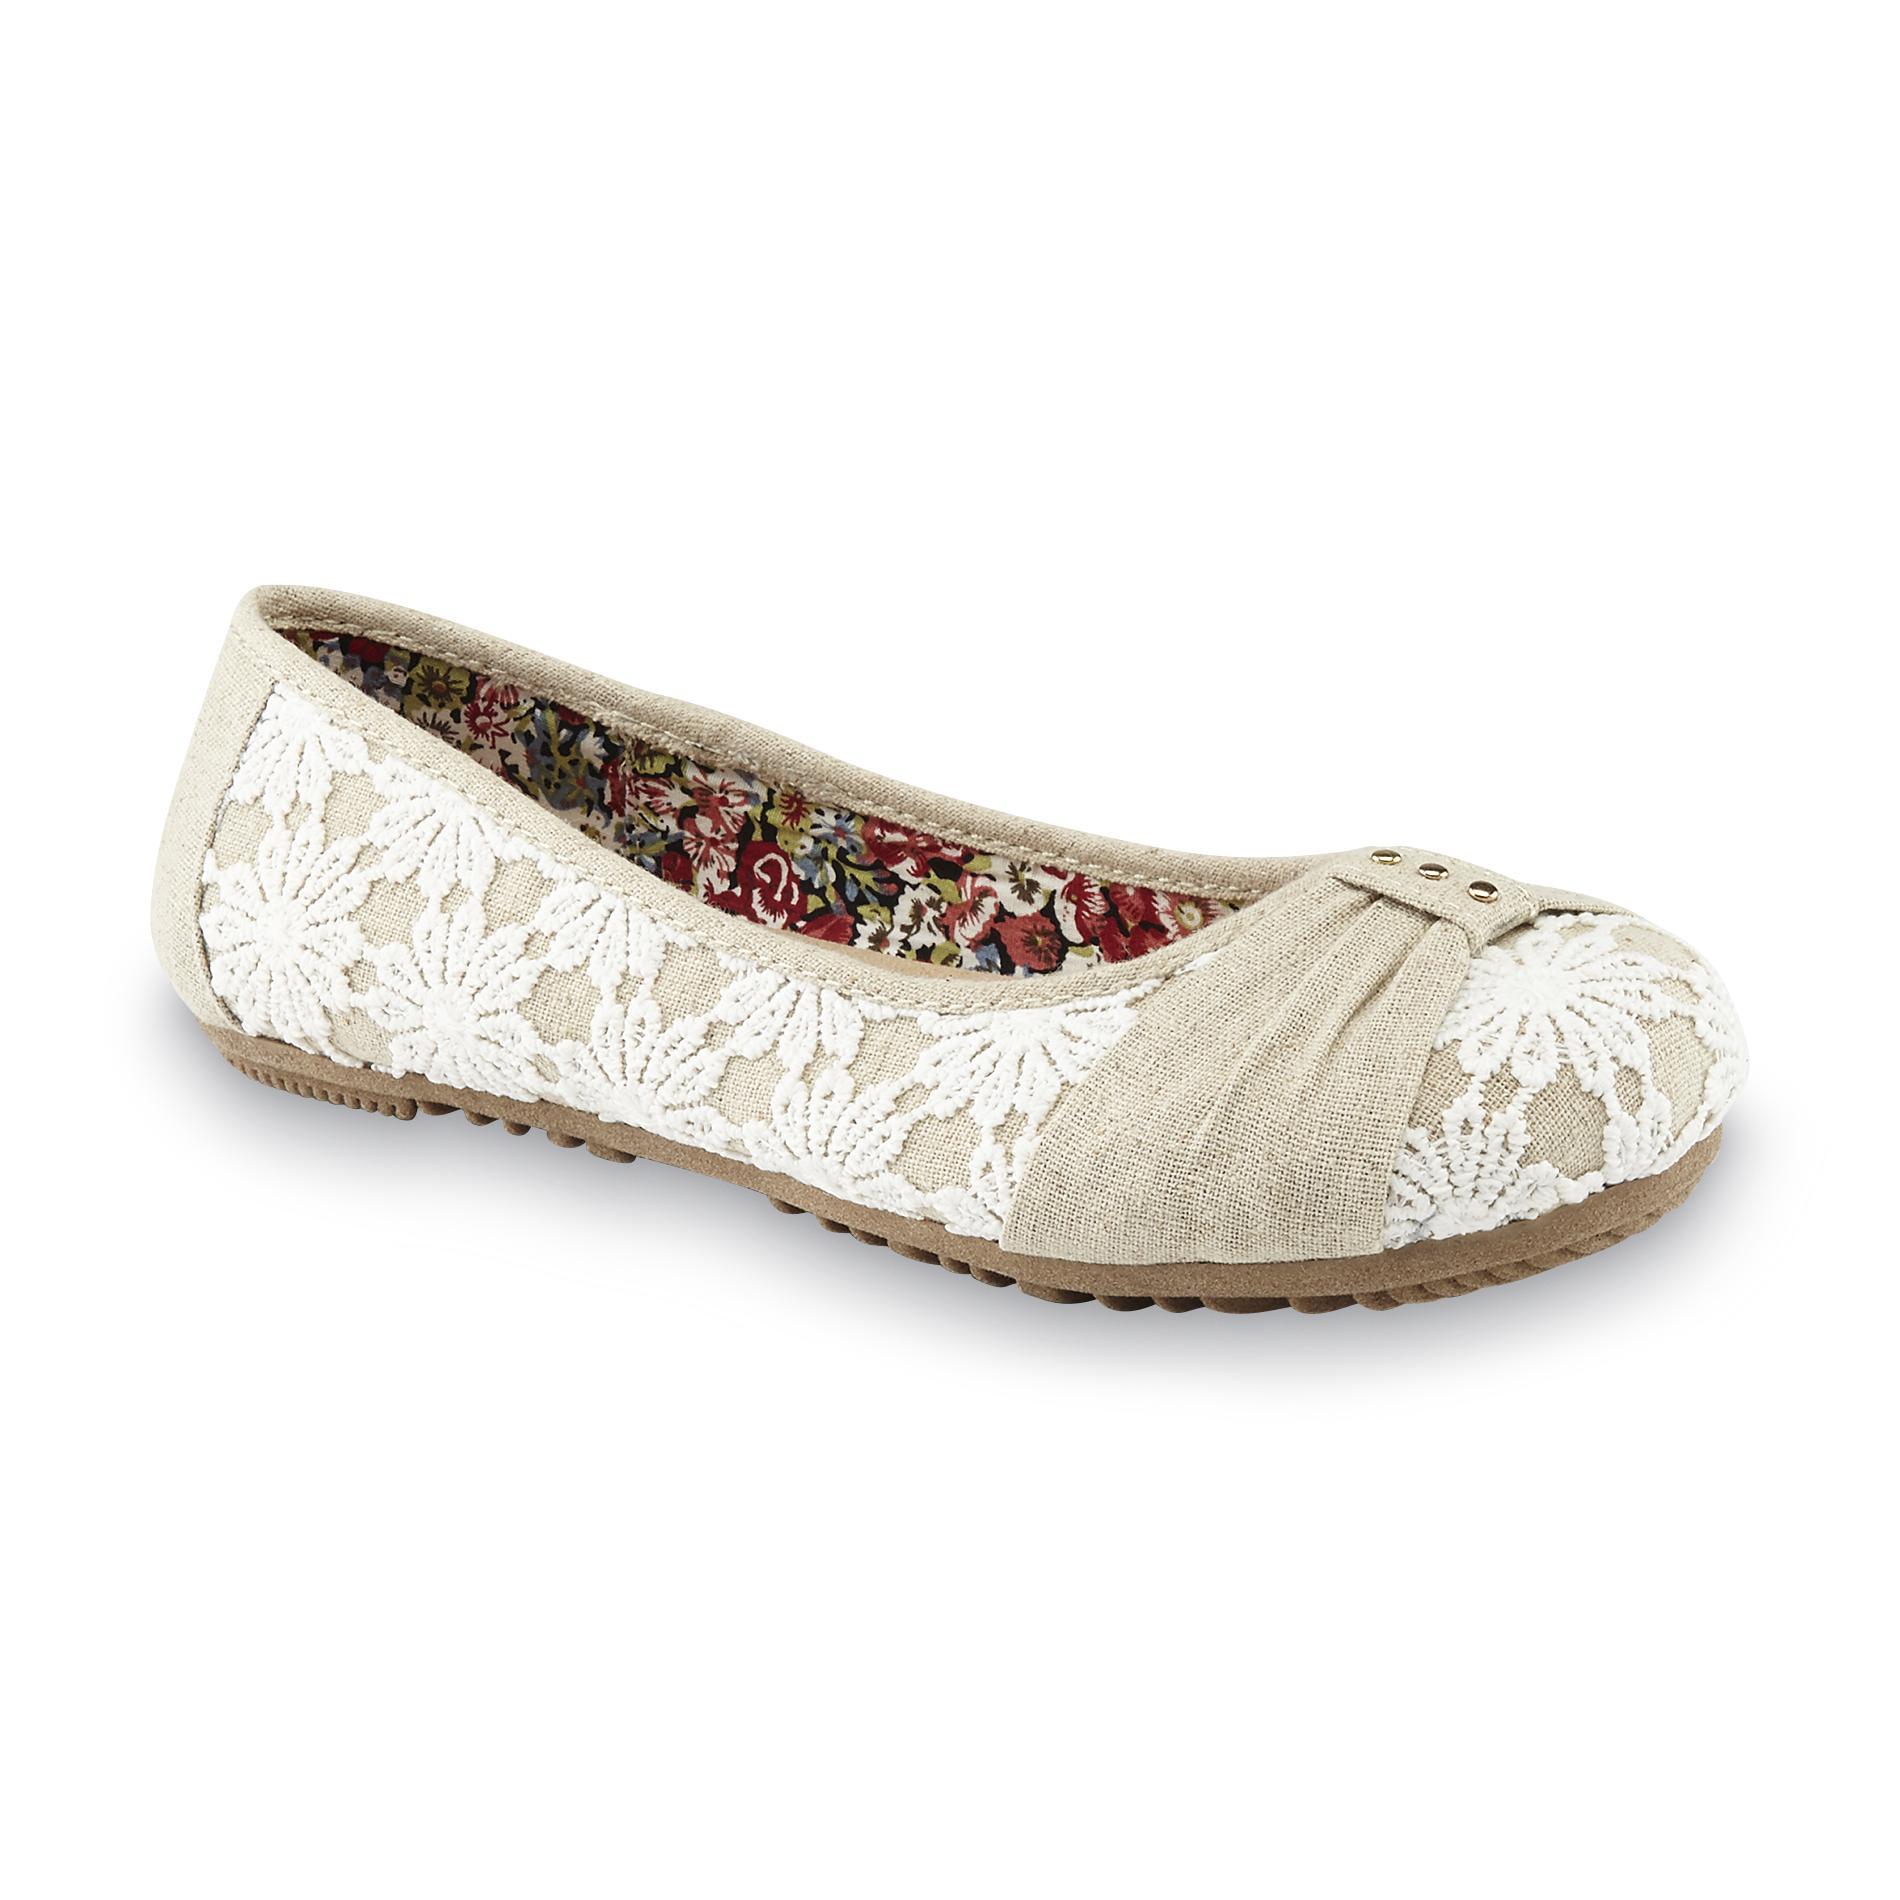 Women's Haido Ivory/White Ballet Flat